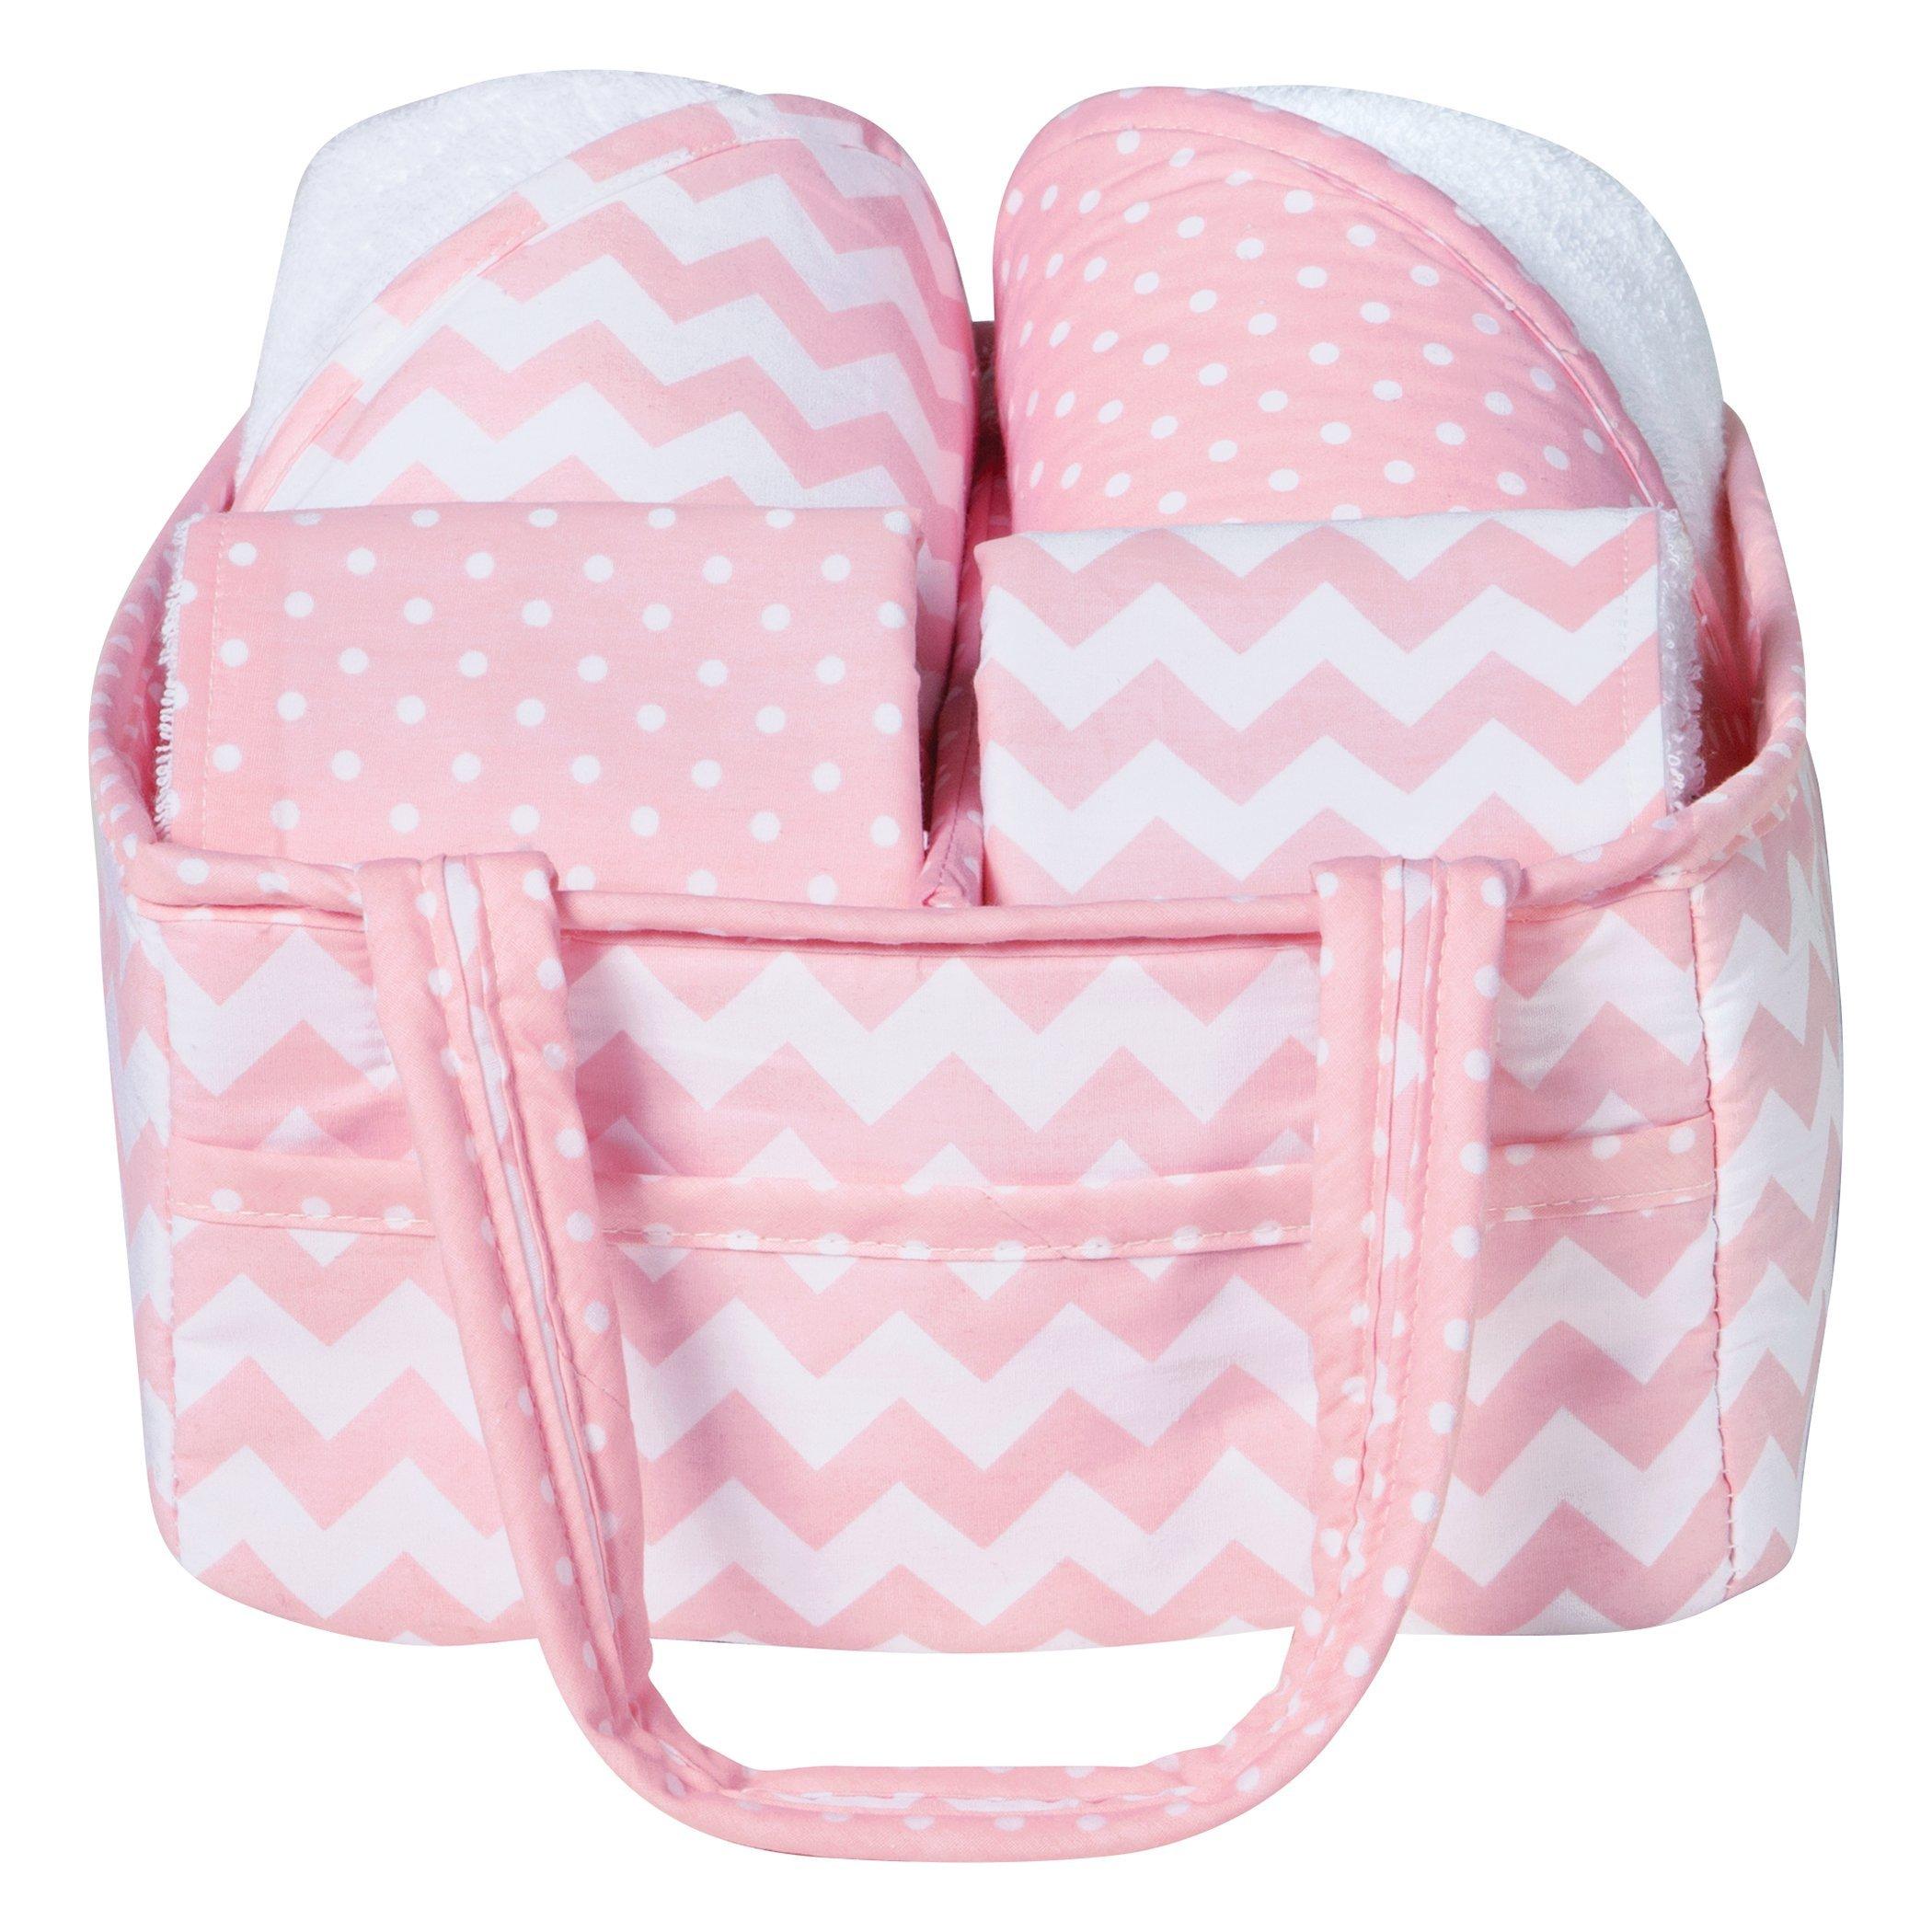 Trend Lab 5 Piece Baby Bath Gift Set, Pink Sky